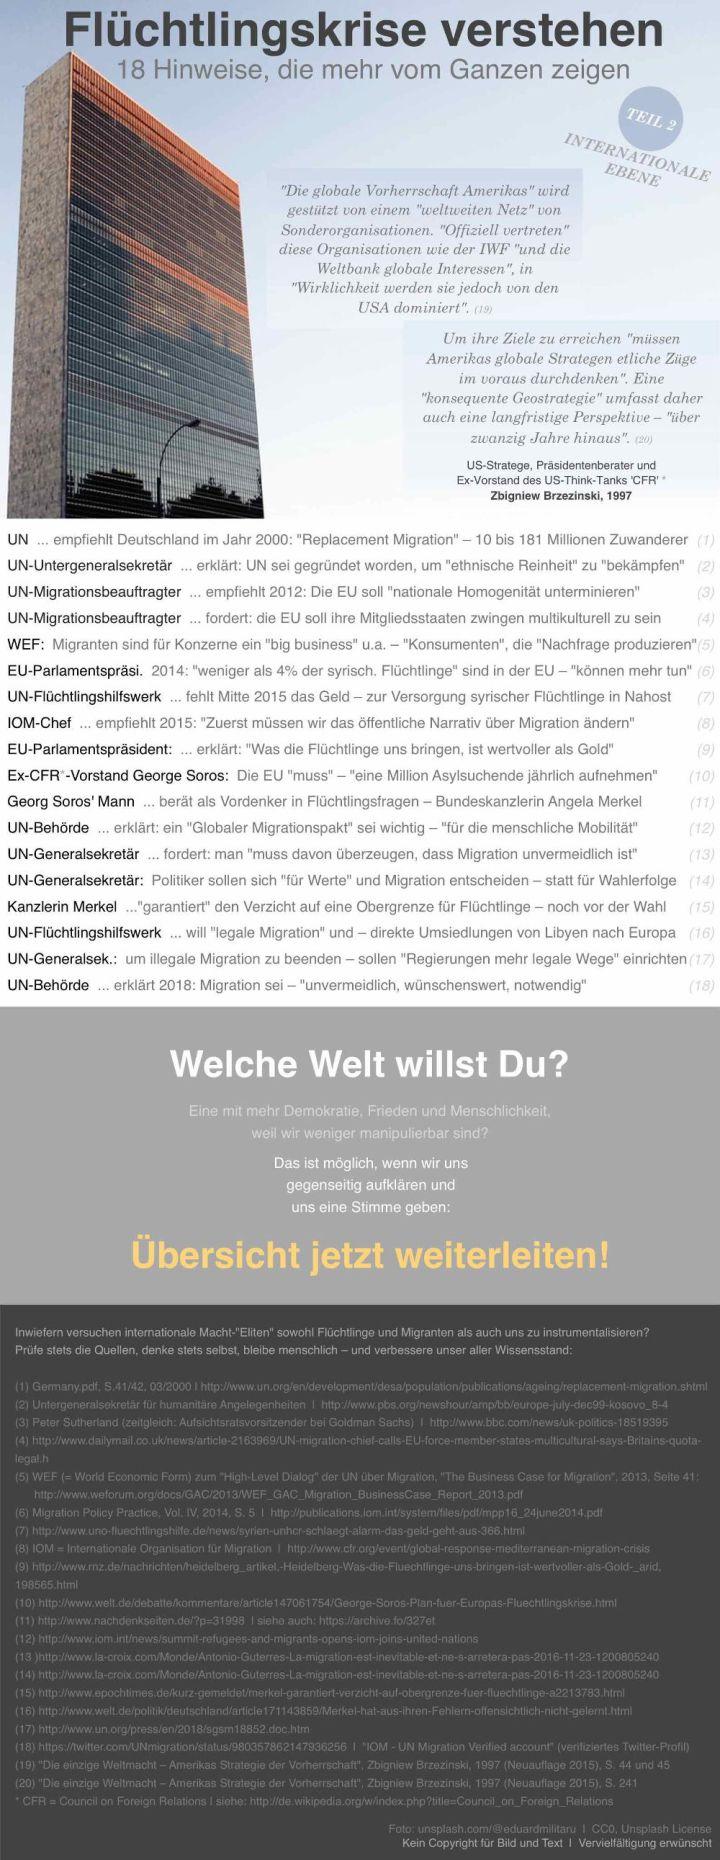 Infografik – Flüchtlingskrise verstehen 2 – Bildquelle: unbekannt / unsplash.com/@eduardmilitaru   CC0, Unsplash License